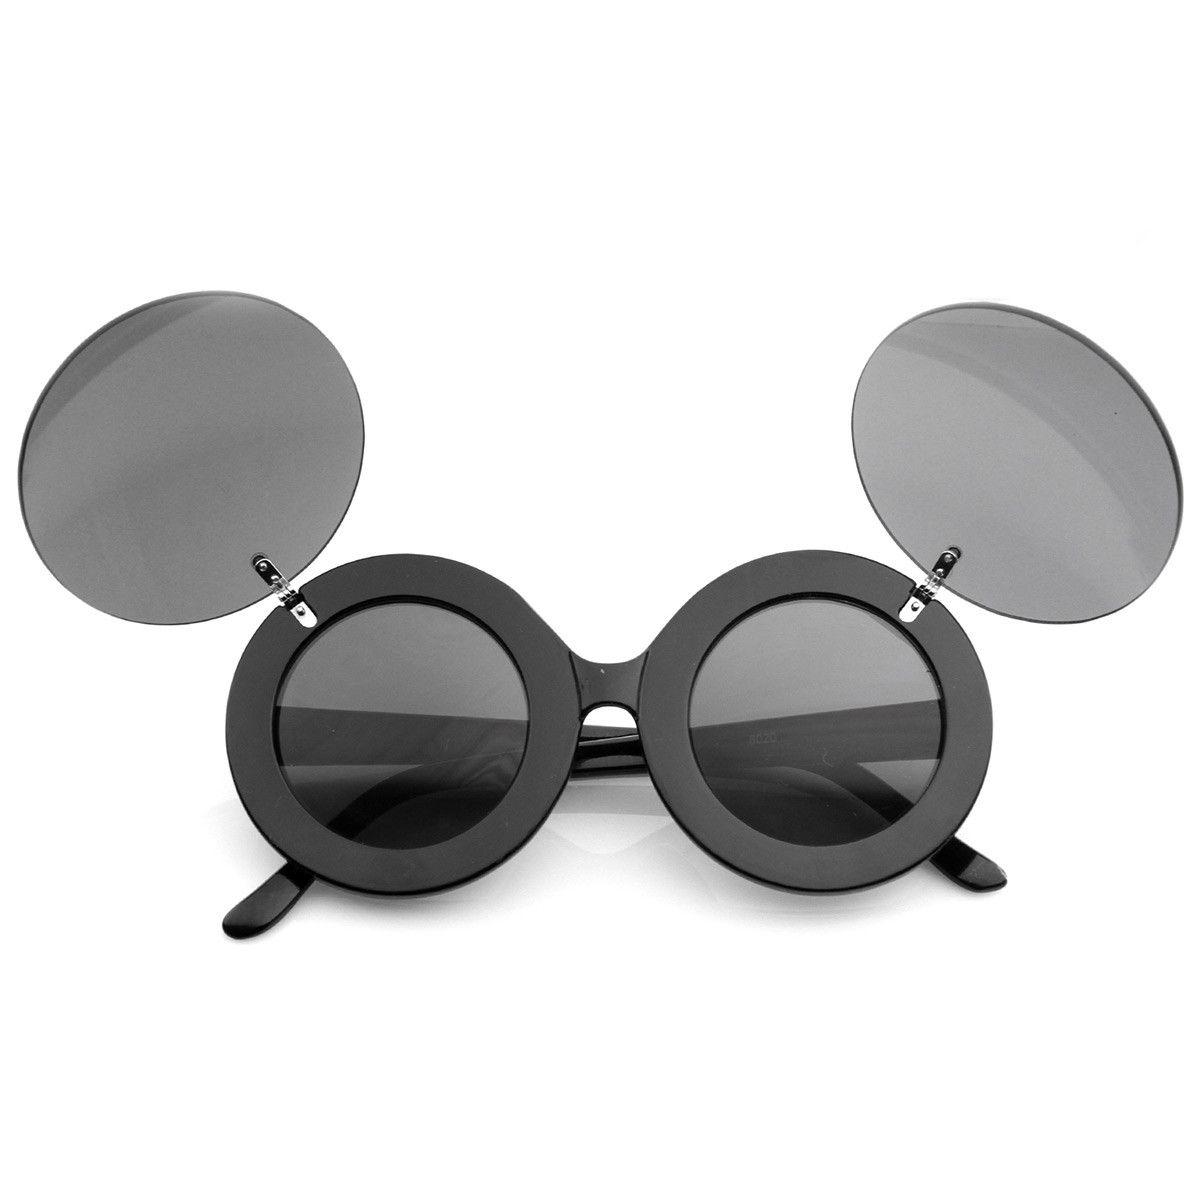 Large designer round circle flipup dual lens glasses